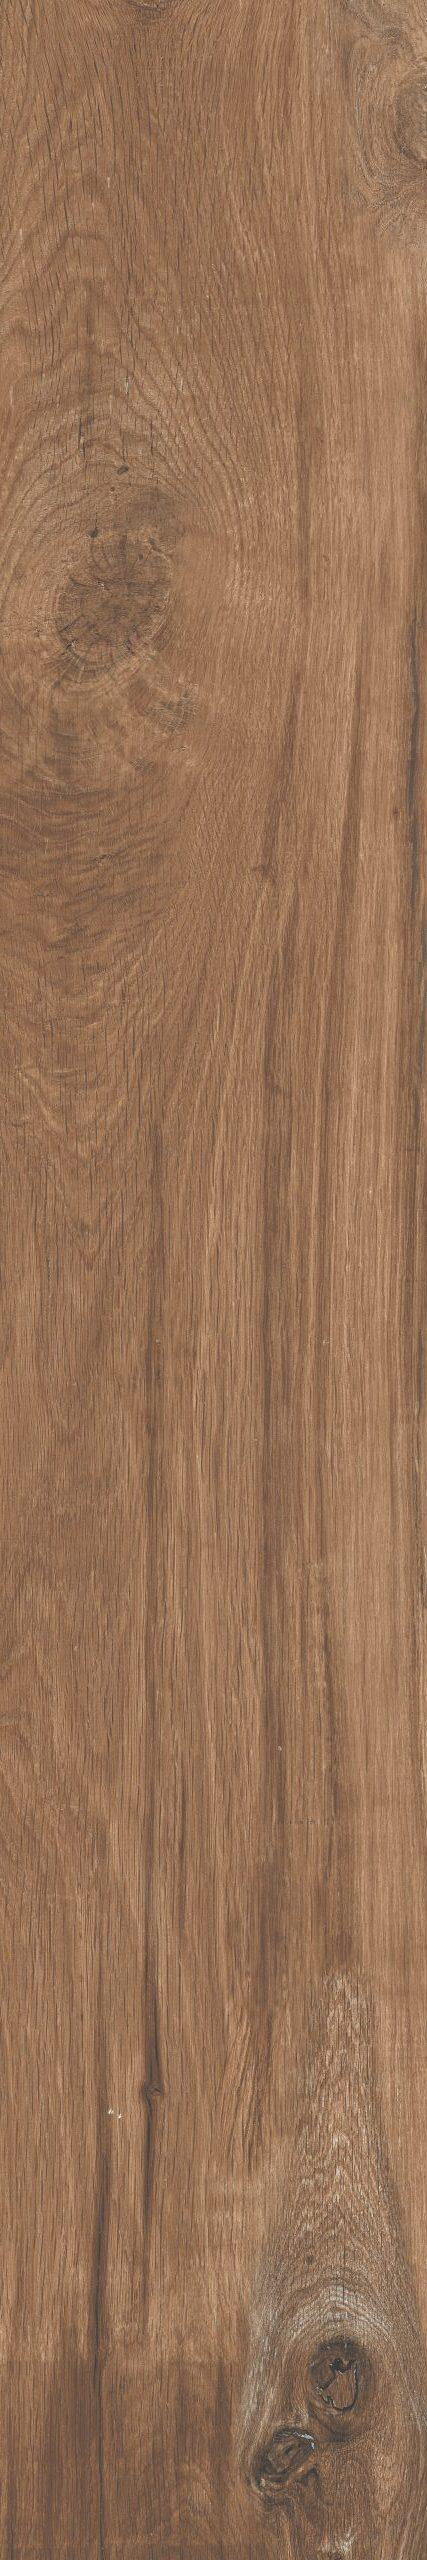 Playwood Nut